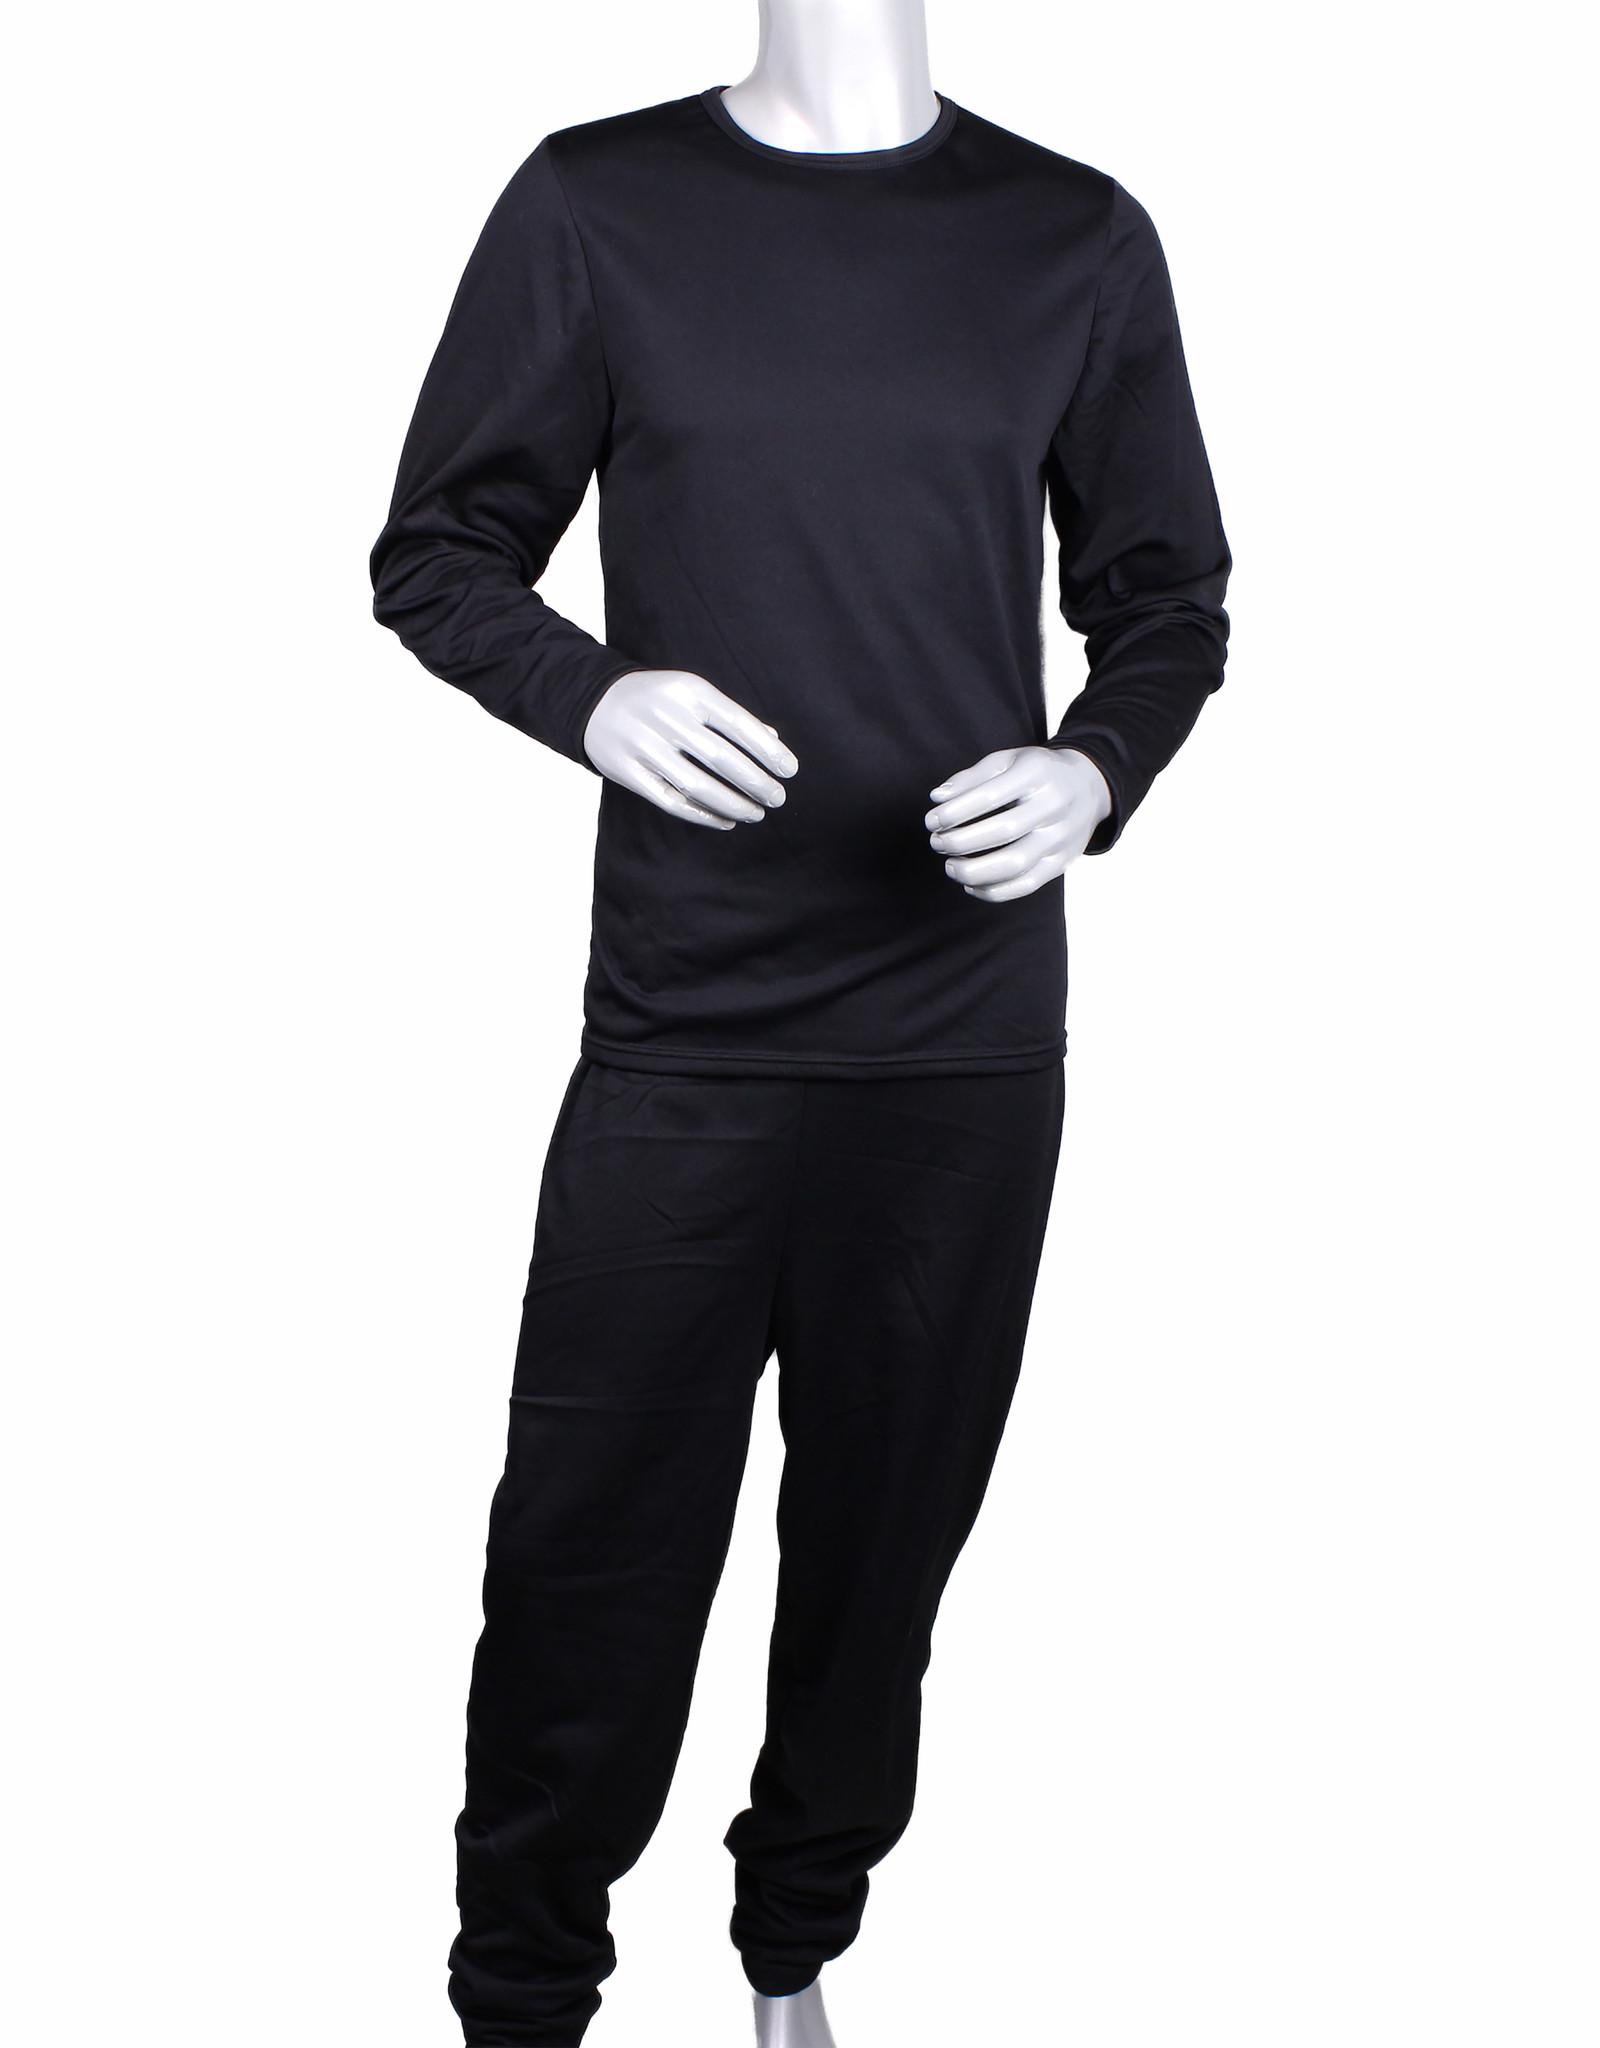 GOLD MEDAL Men's Long Underwear Set